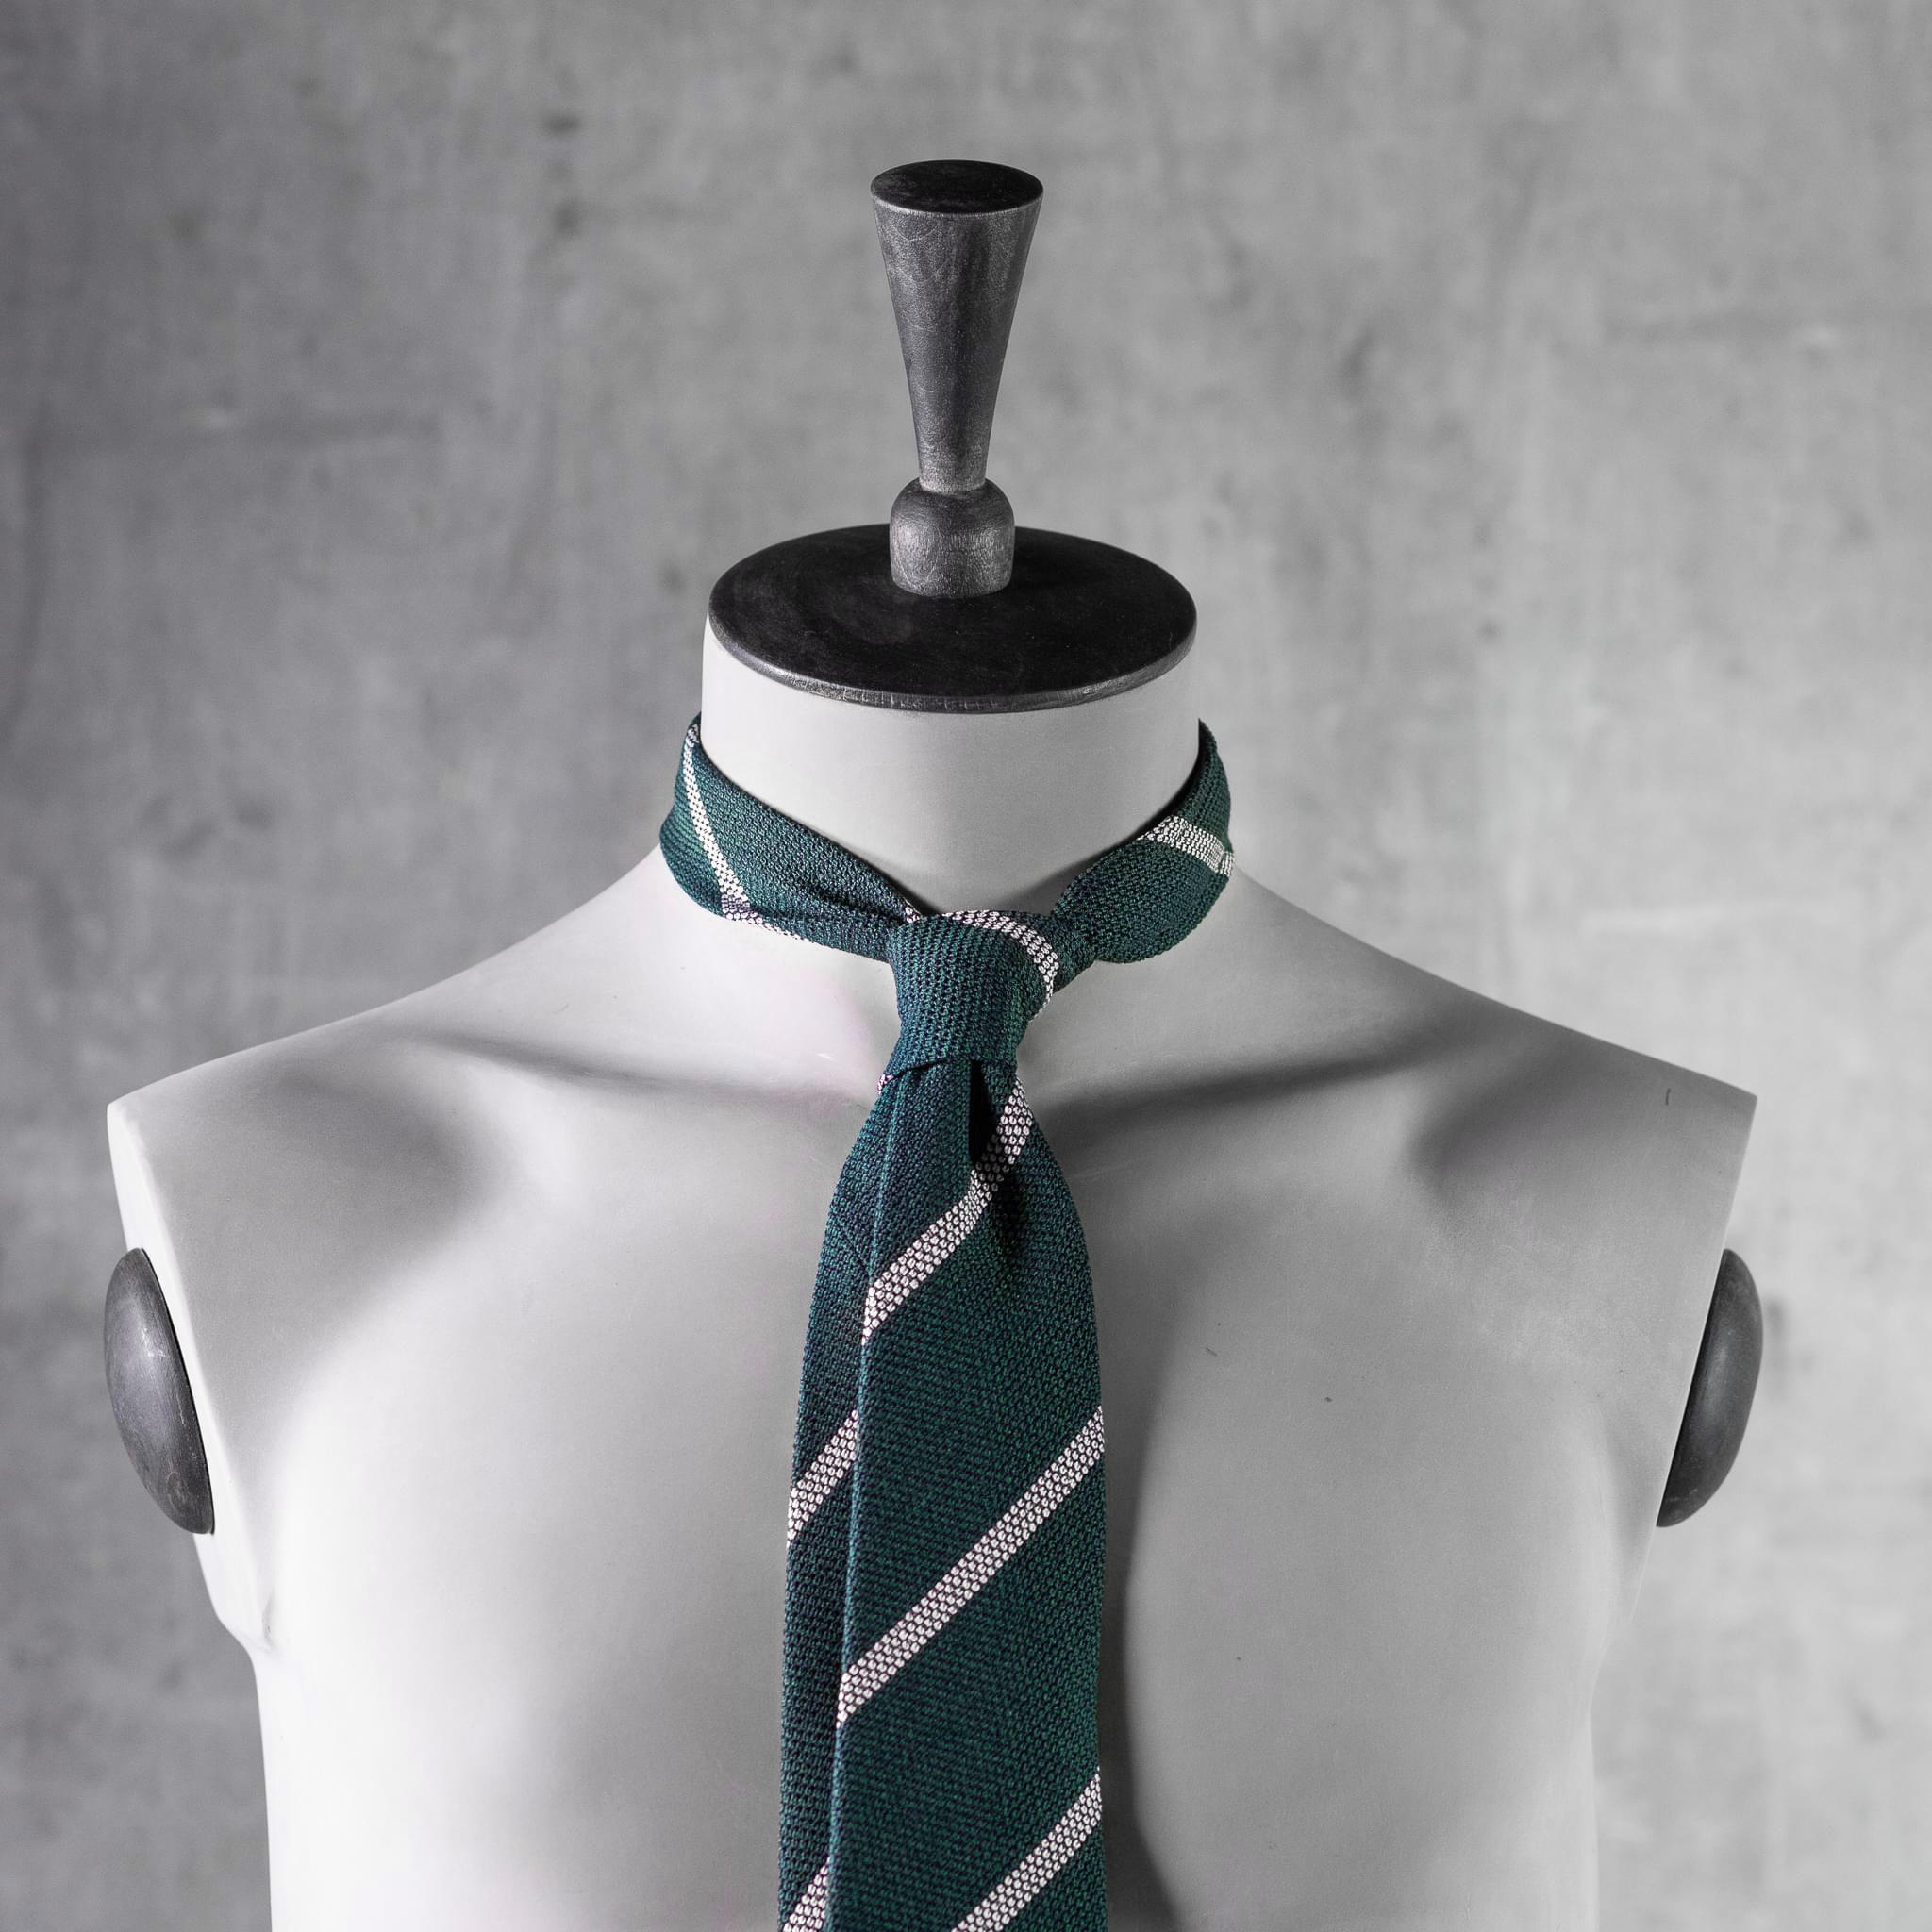 BOUCLÉ-0443-Tie-Initials-Corbata-Iniciales-The-Seelk-4